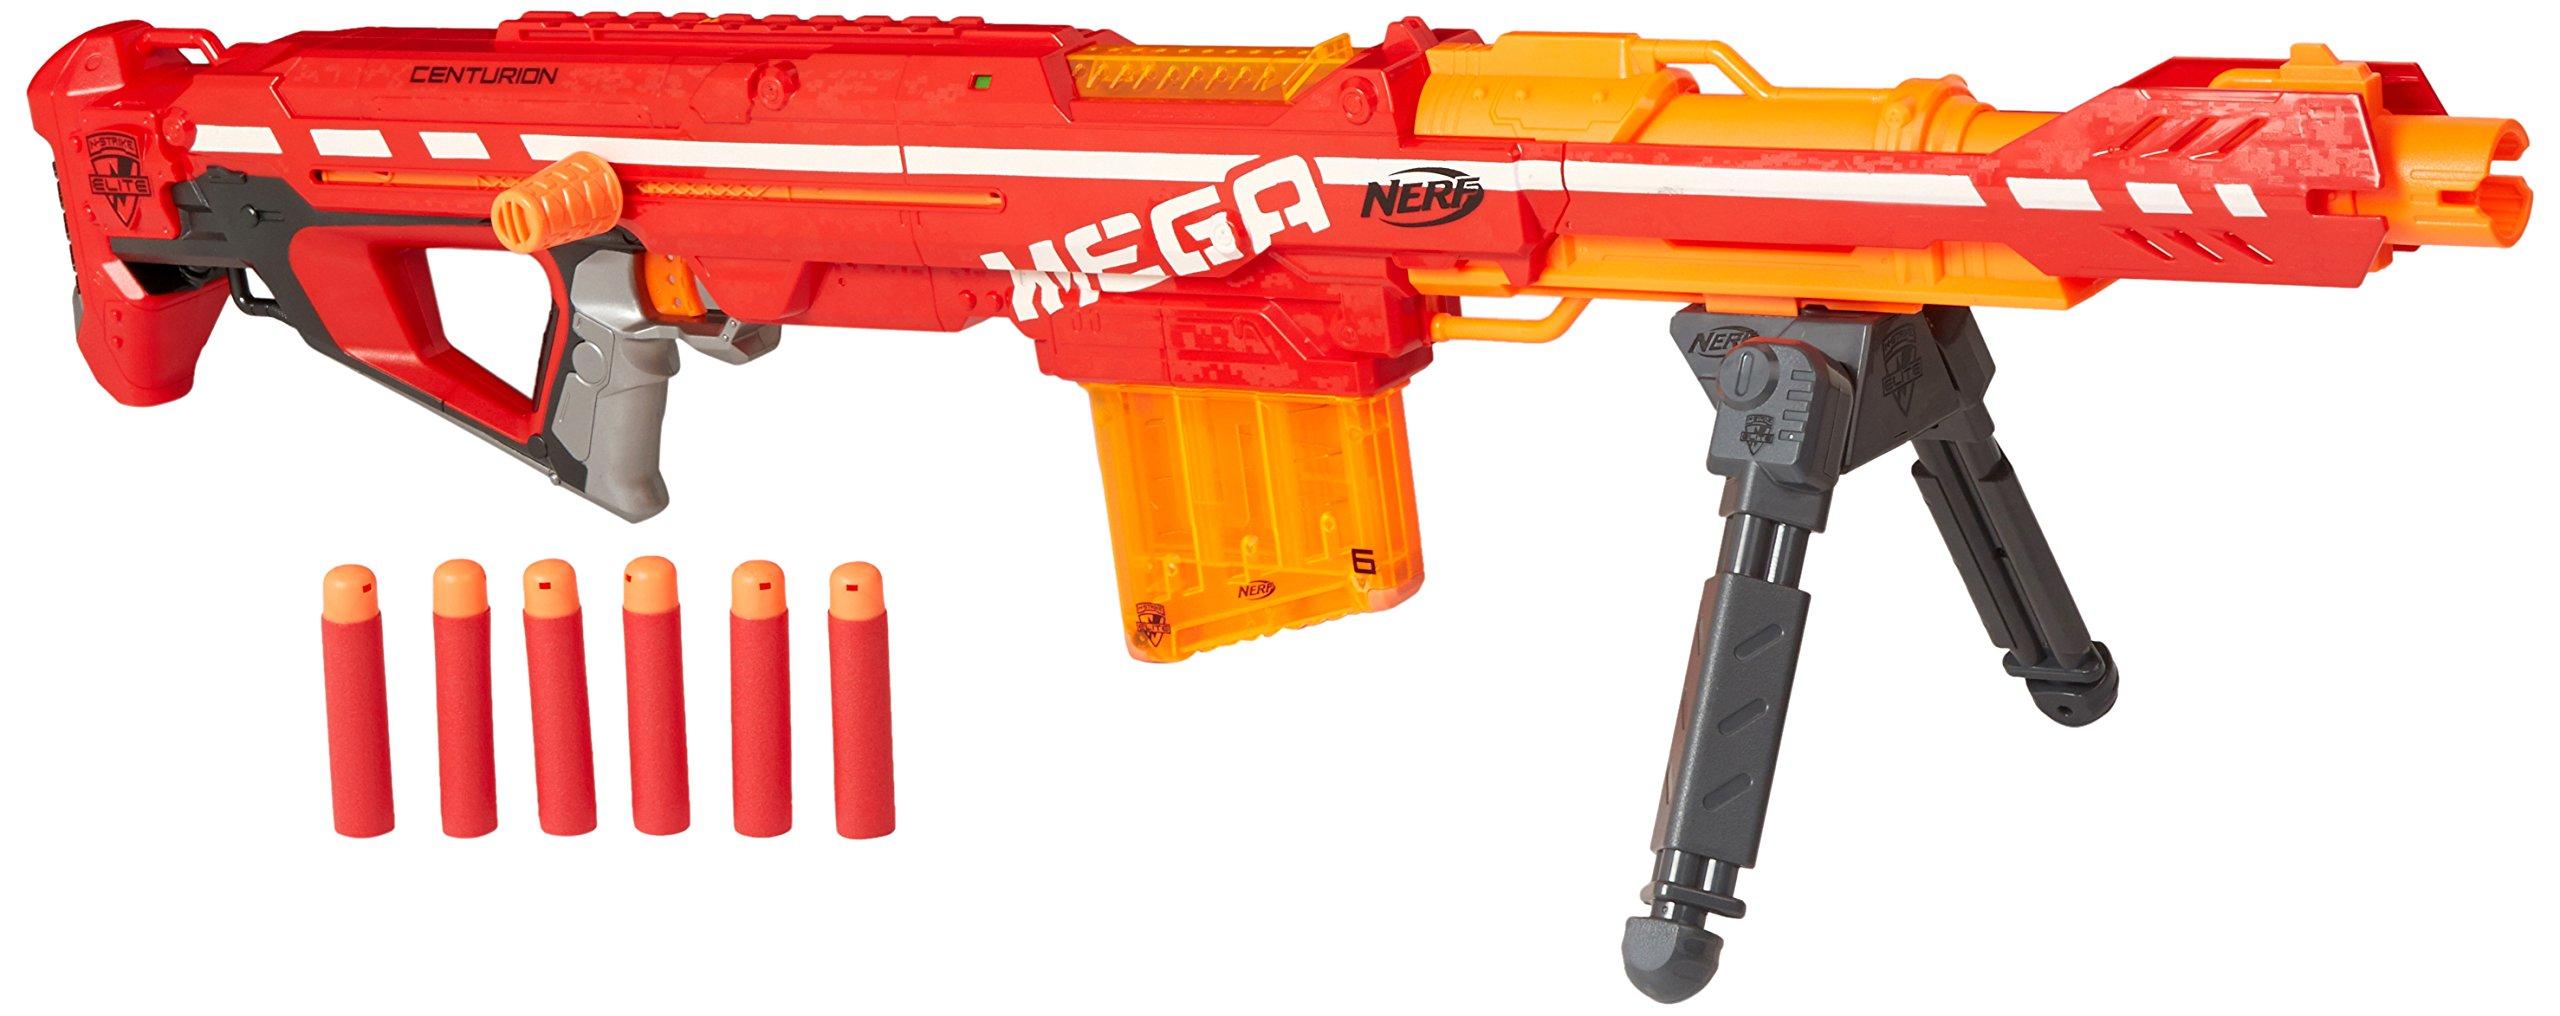 Nerf N-Strike Elite Centurion Blaster by NERF (Image #1)